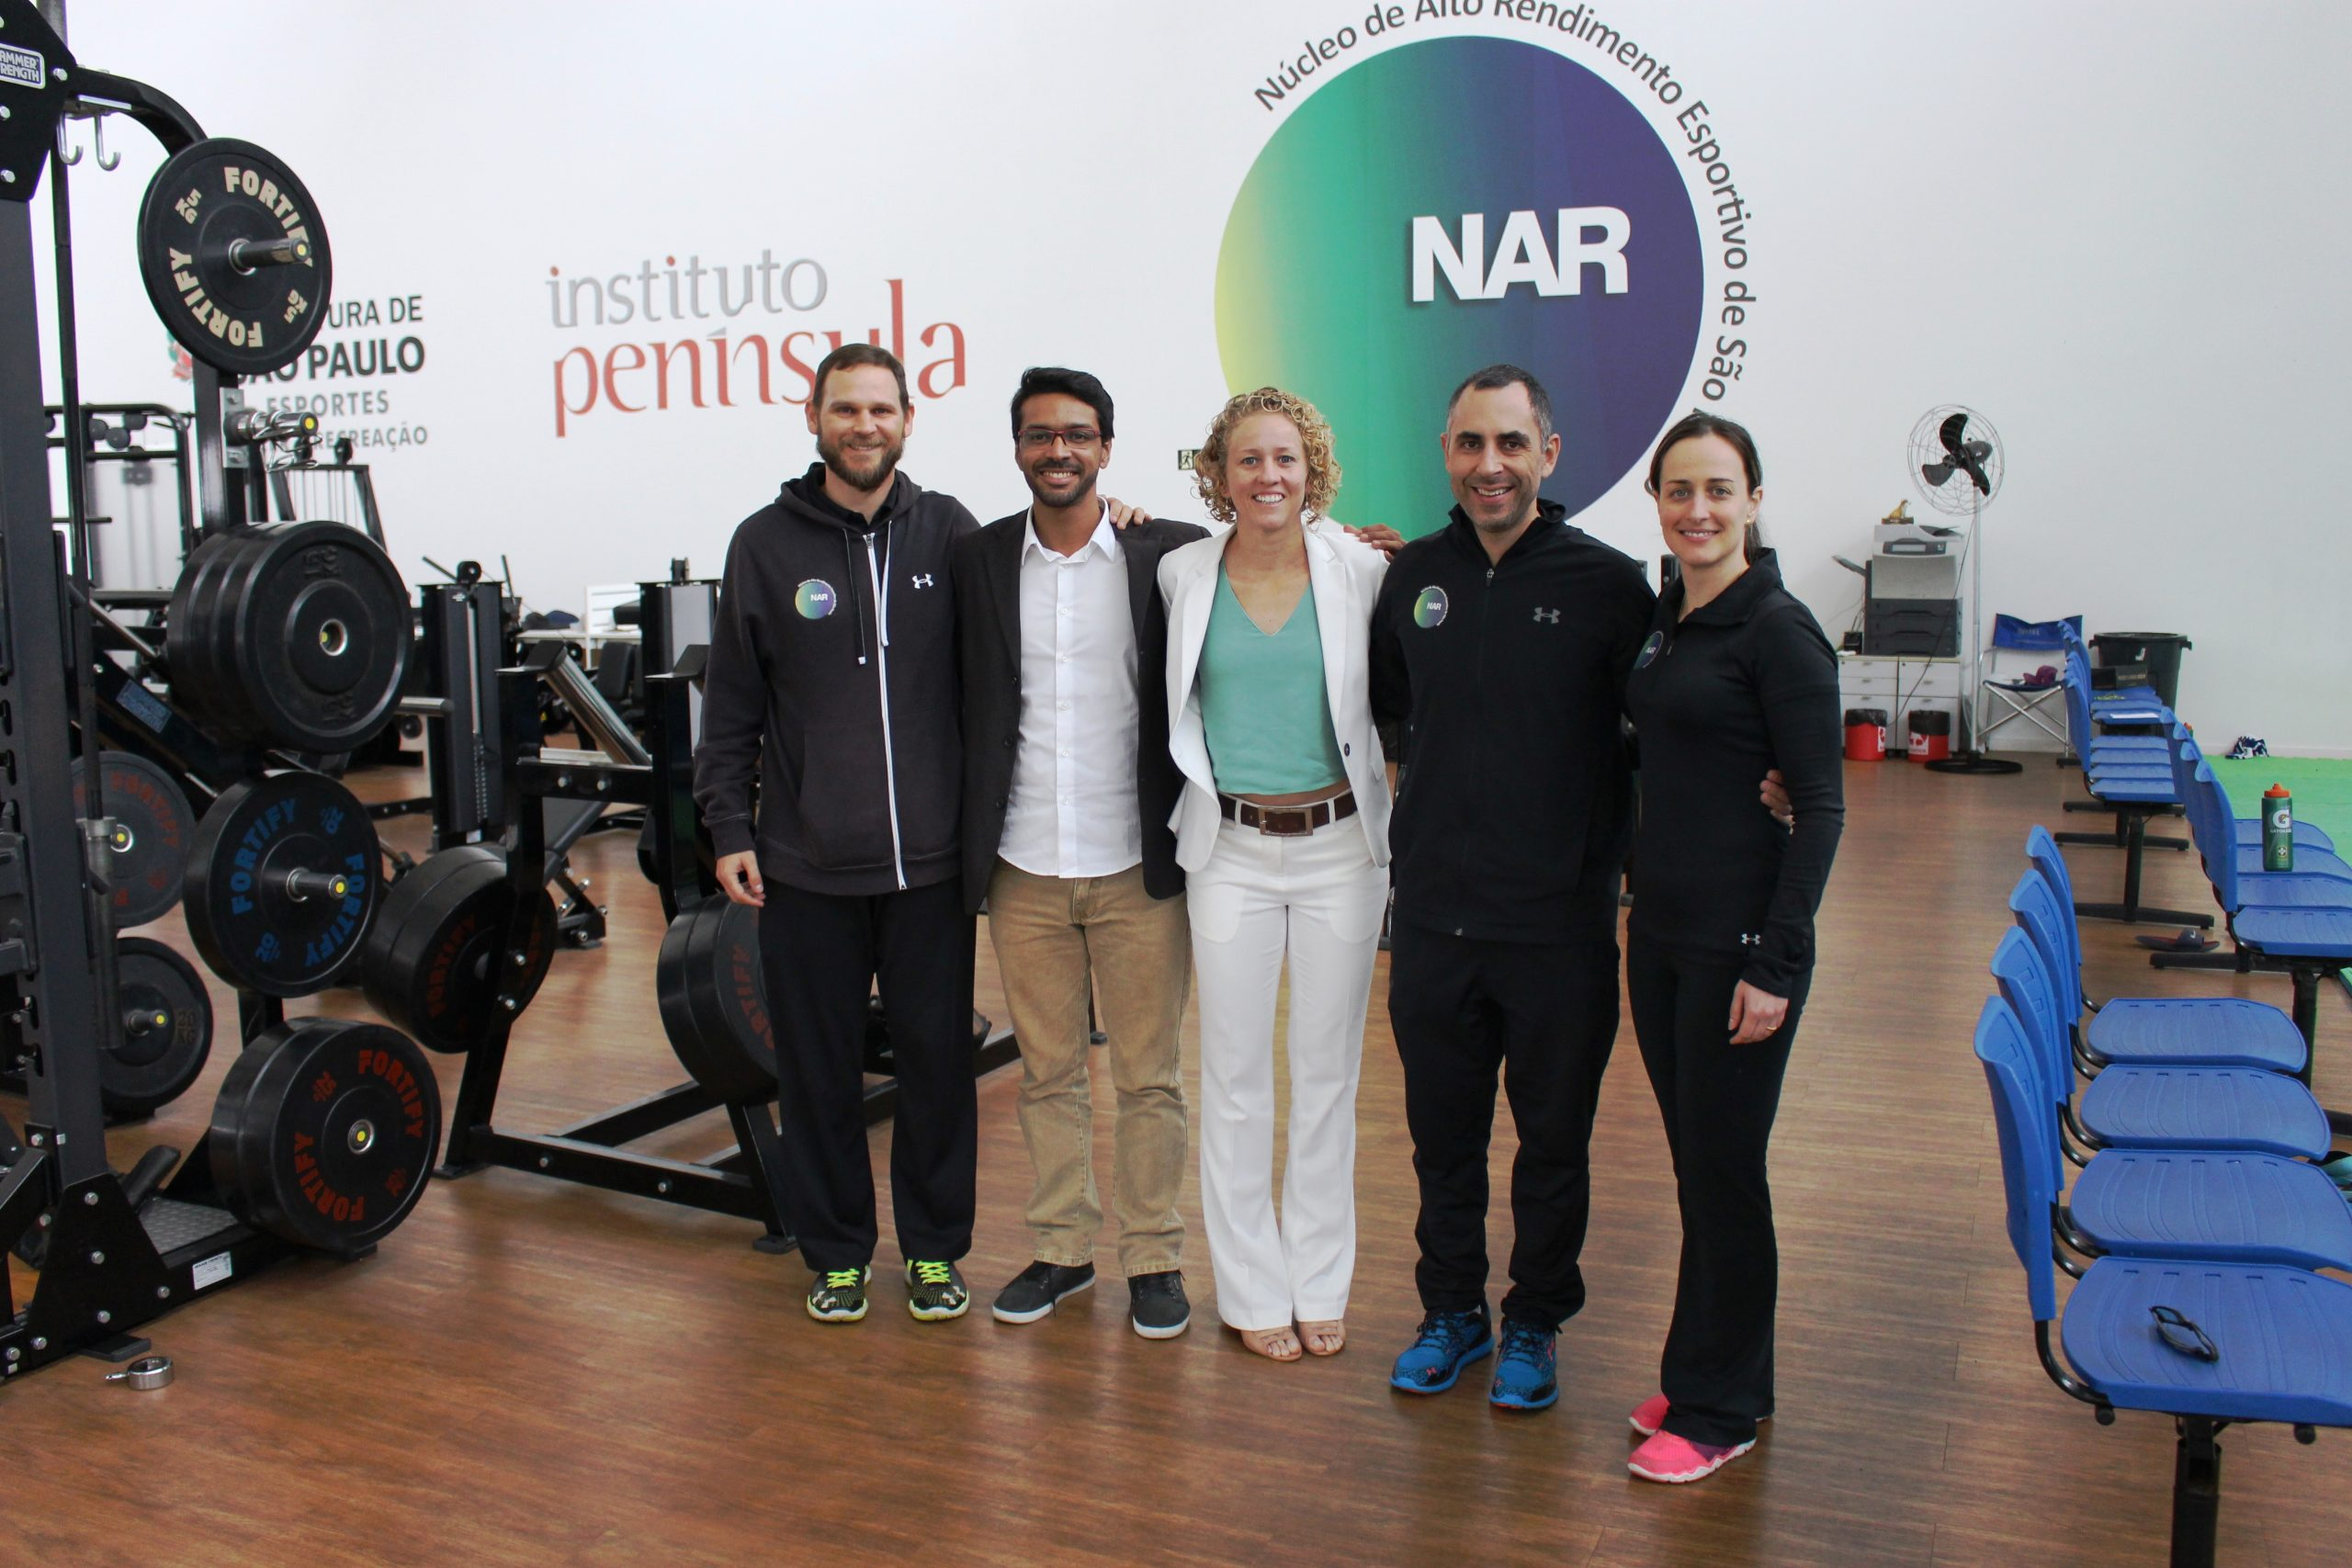 Bicampeã panamericana e medalhista olímpica Yane Marques visita o NAR-SP